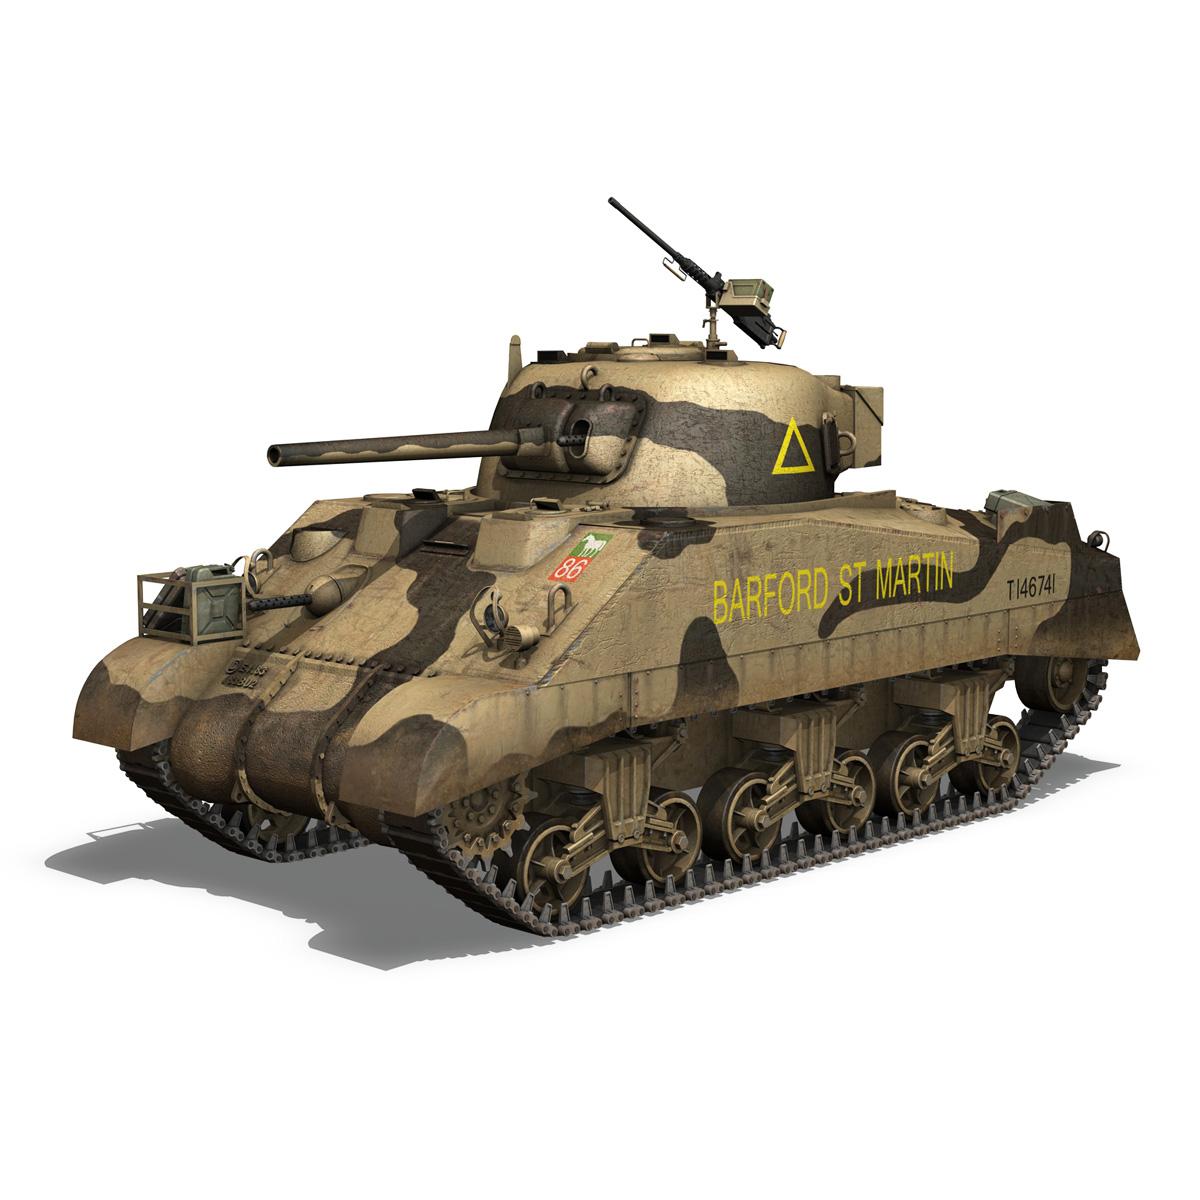 M4 Sherman MK.III - Barford St Martin 3d model  266952